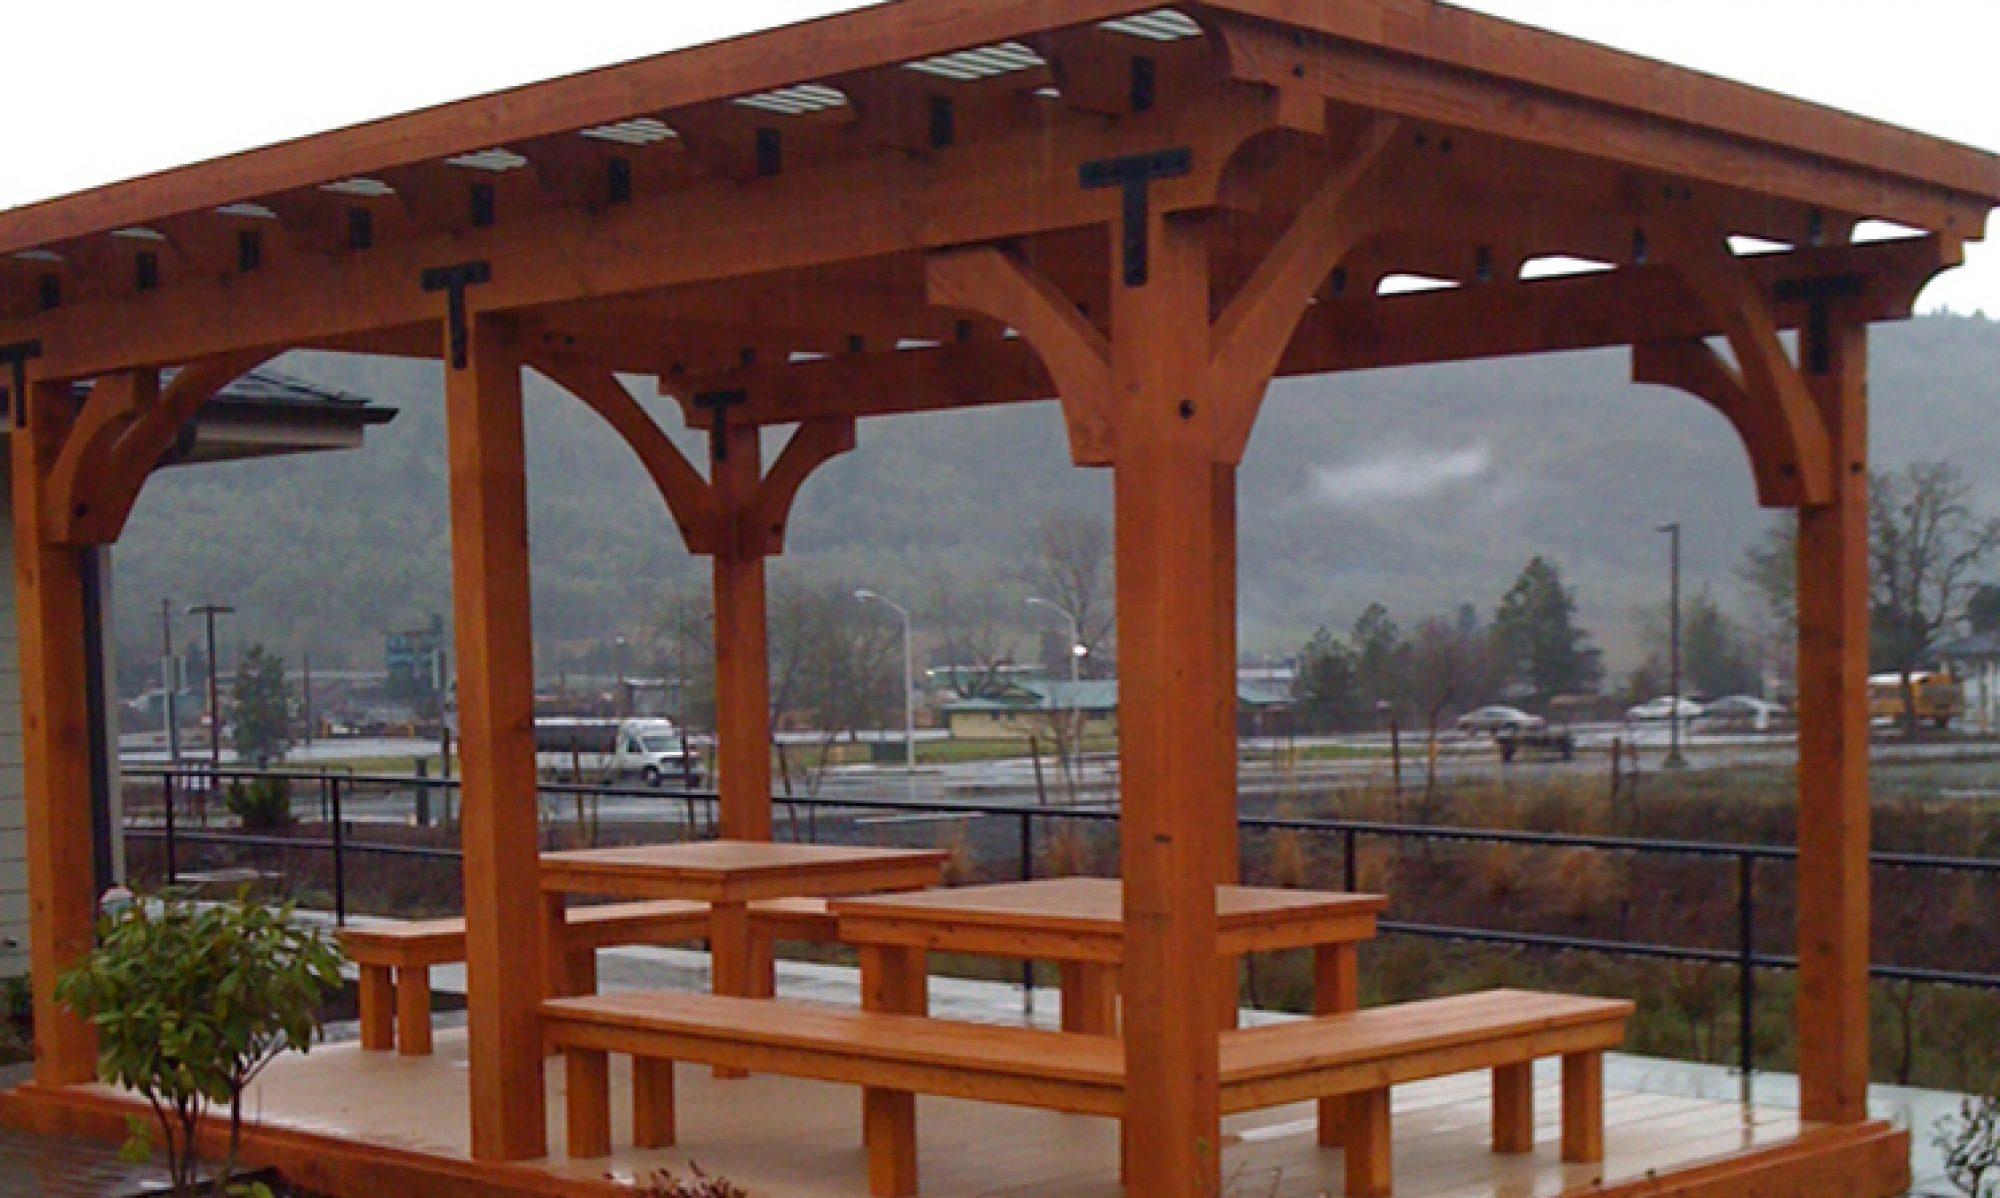 Oregon Overseas Timber Company Inc.